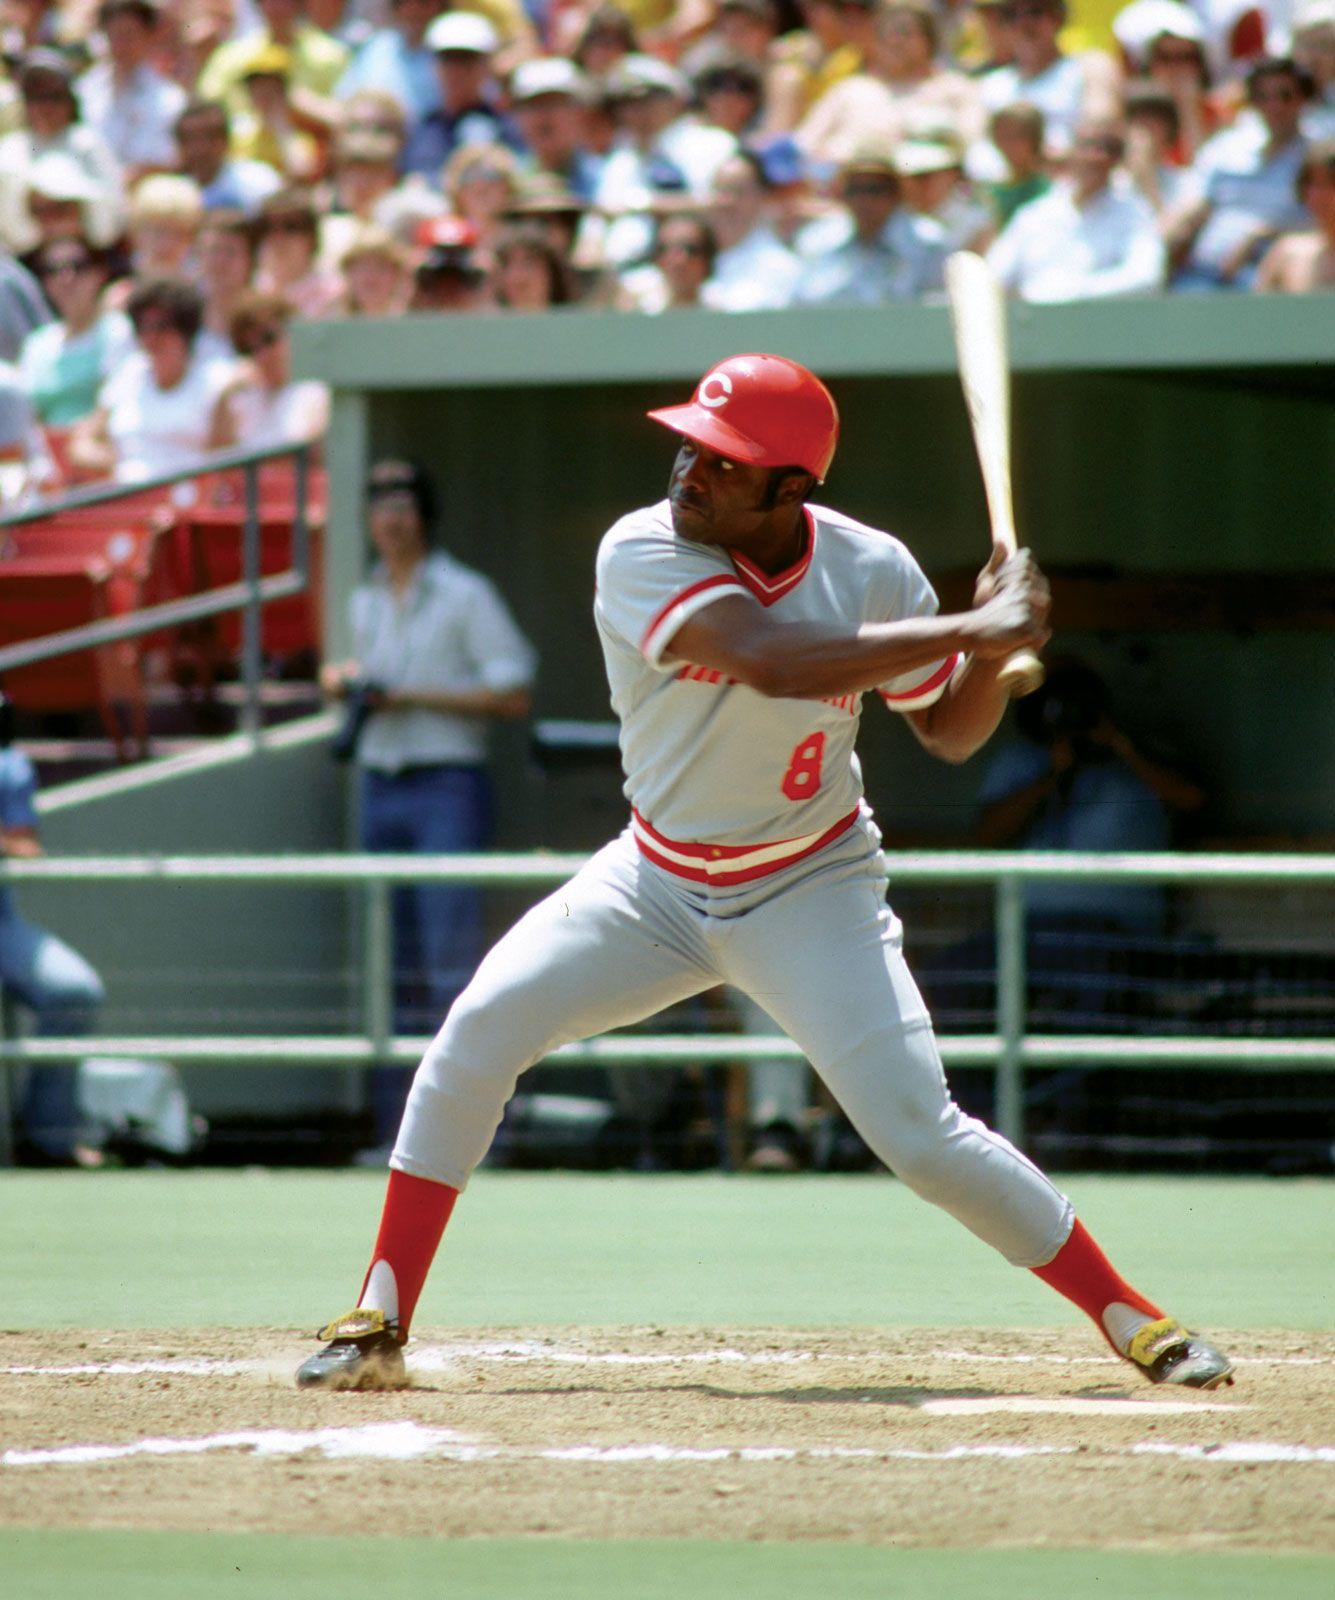 Pin By Jarren Sanders On Baseball Hall Of Famers Joe Morgan Cincinnati Reds Baseball Best Baseball Player